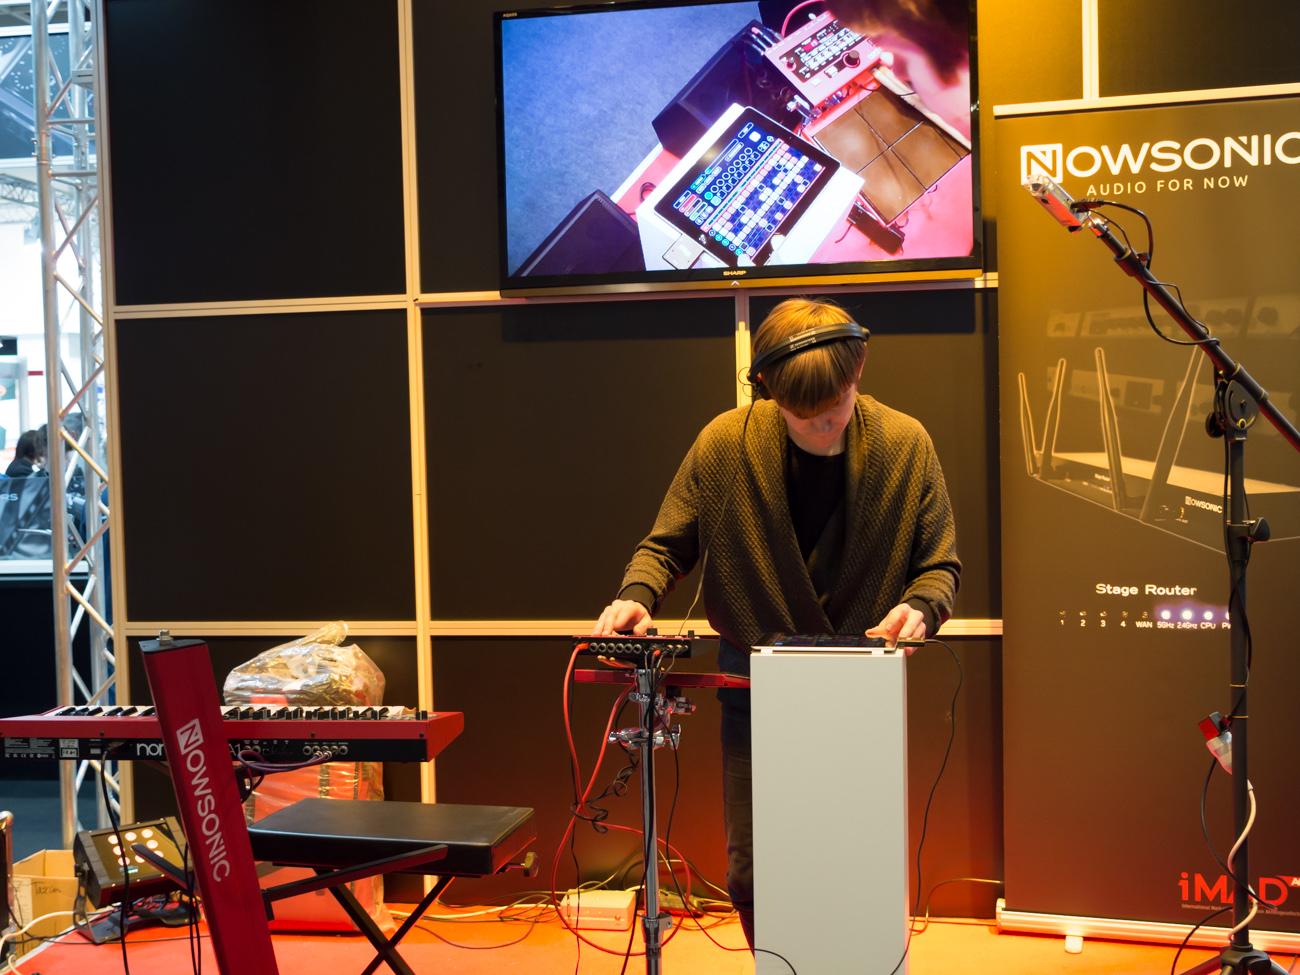 Musikmesse 2014 : Nord